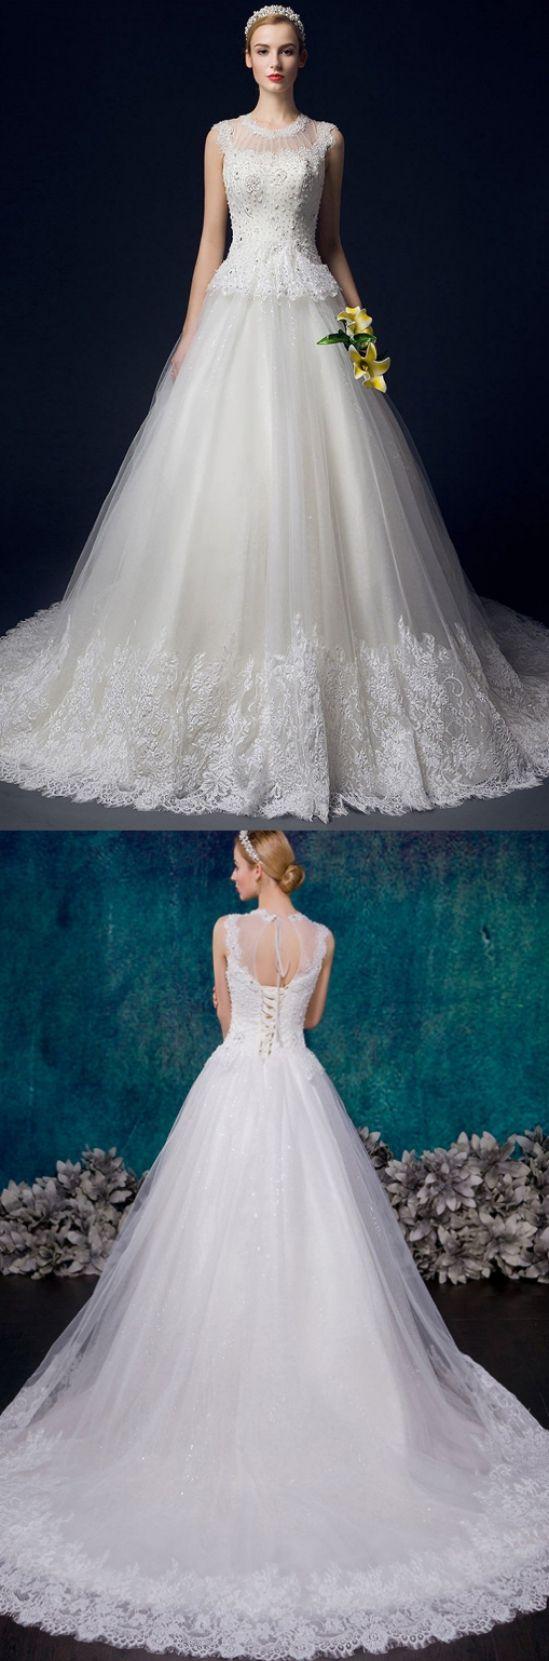 Gown wedding dresses white wedding dresses long wedding dresses